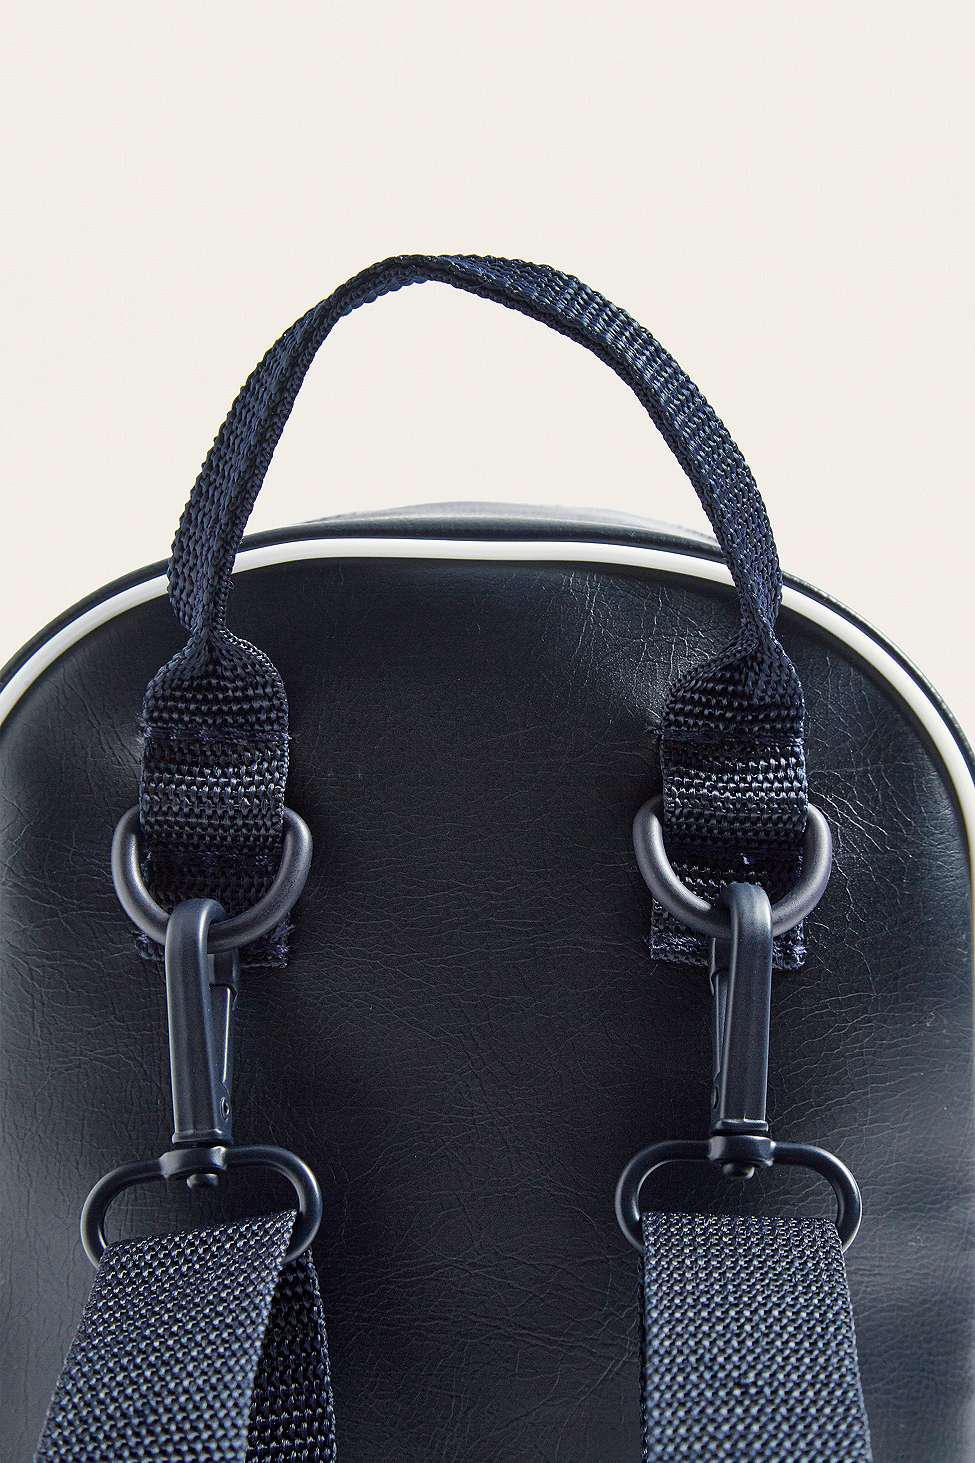 da91263068 Adidas Originals Vintage Mini Backpack